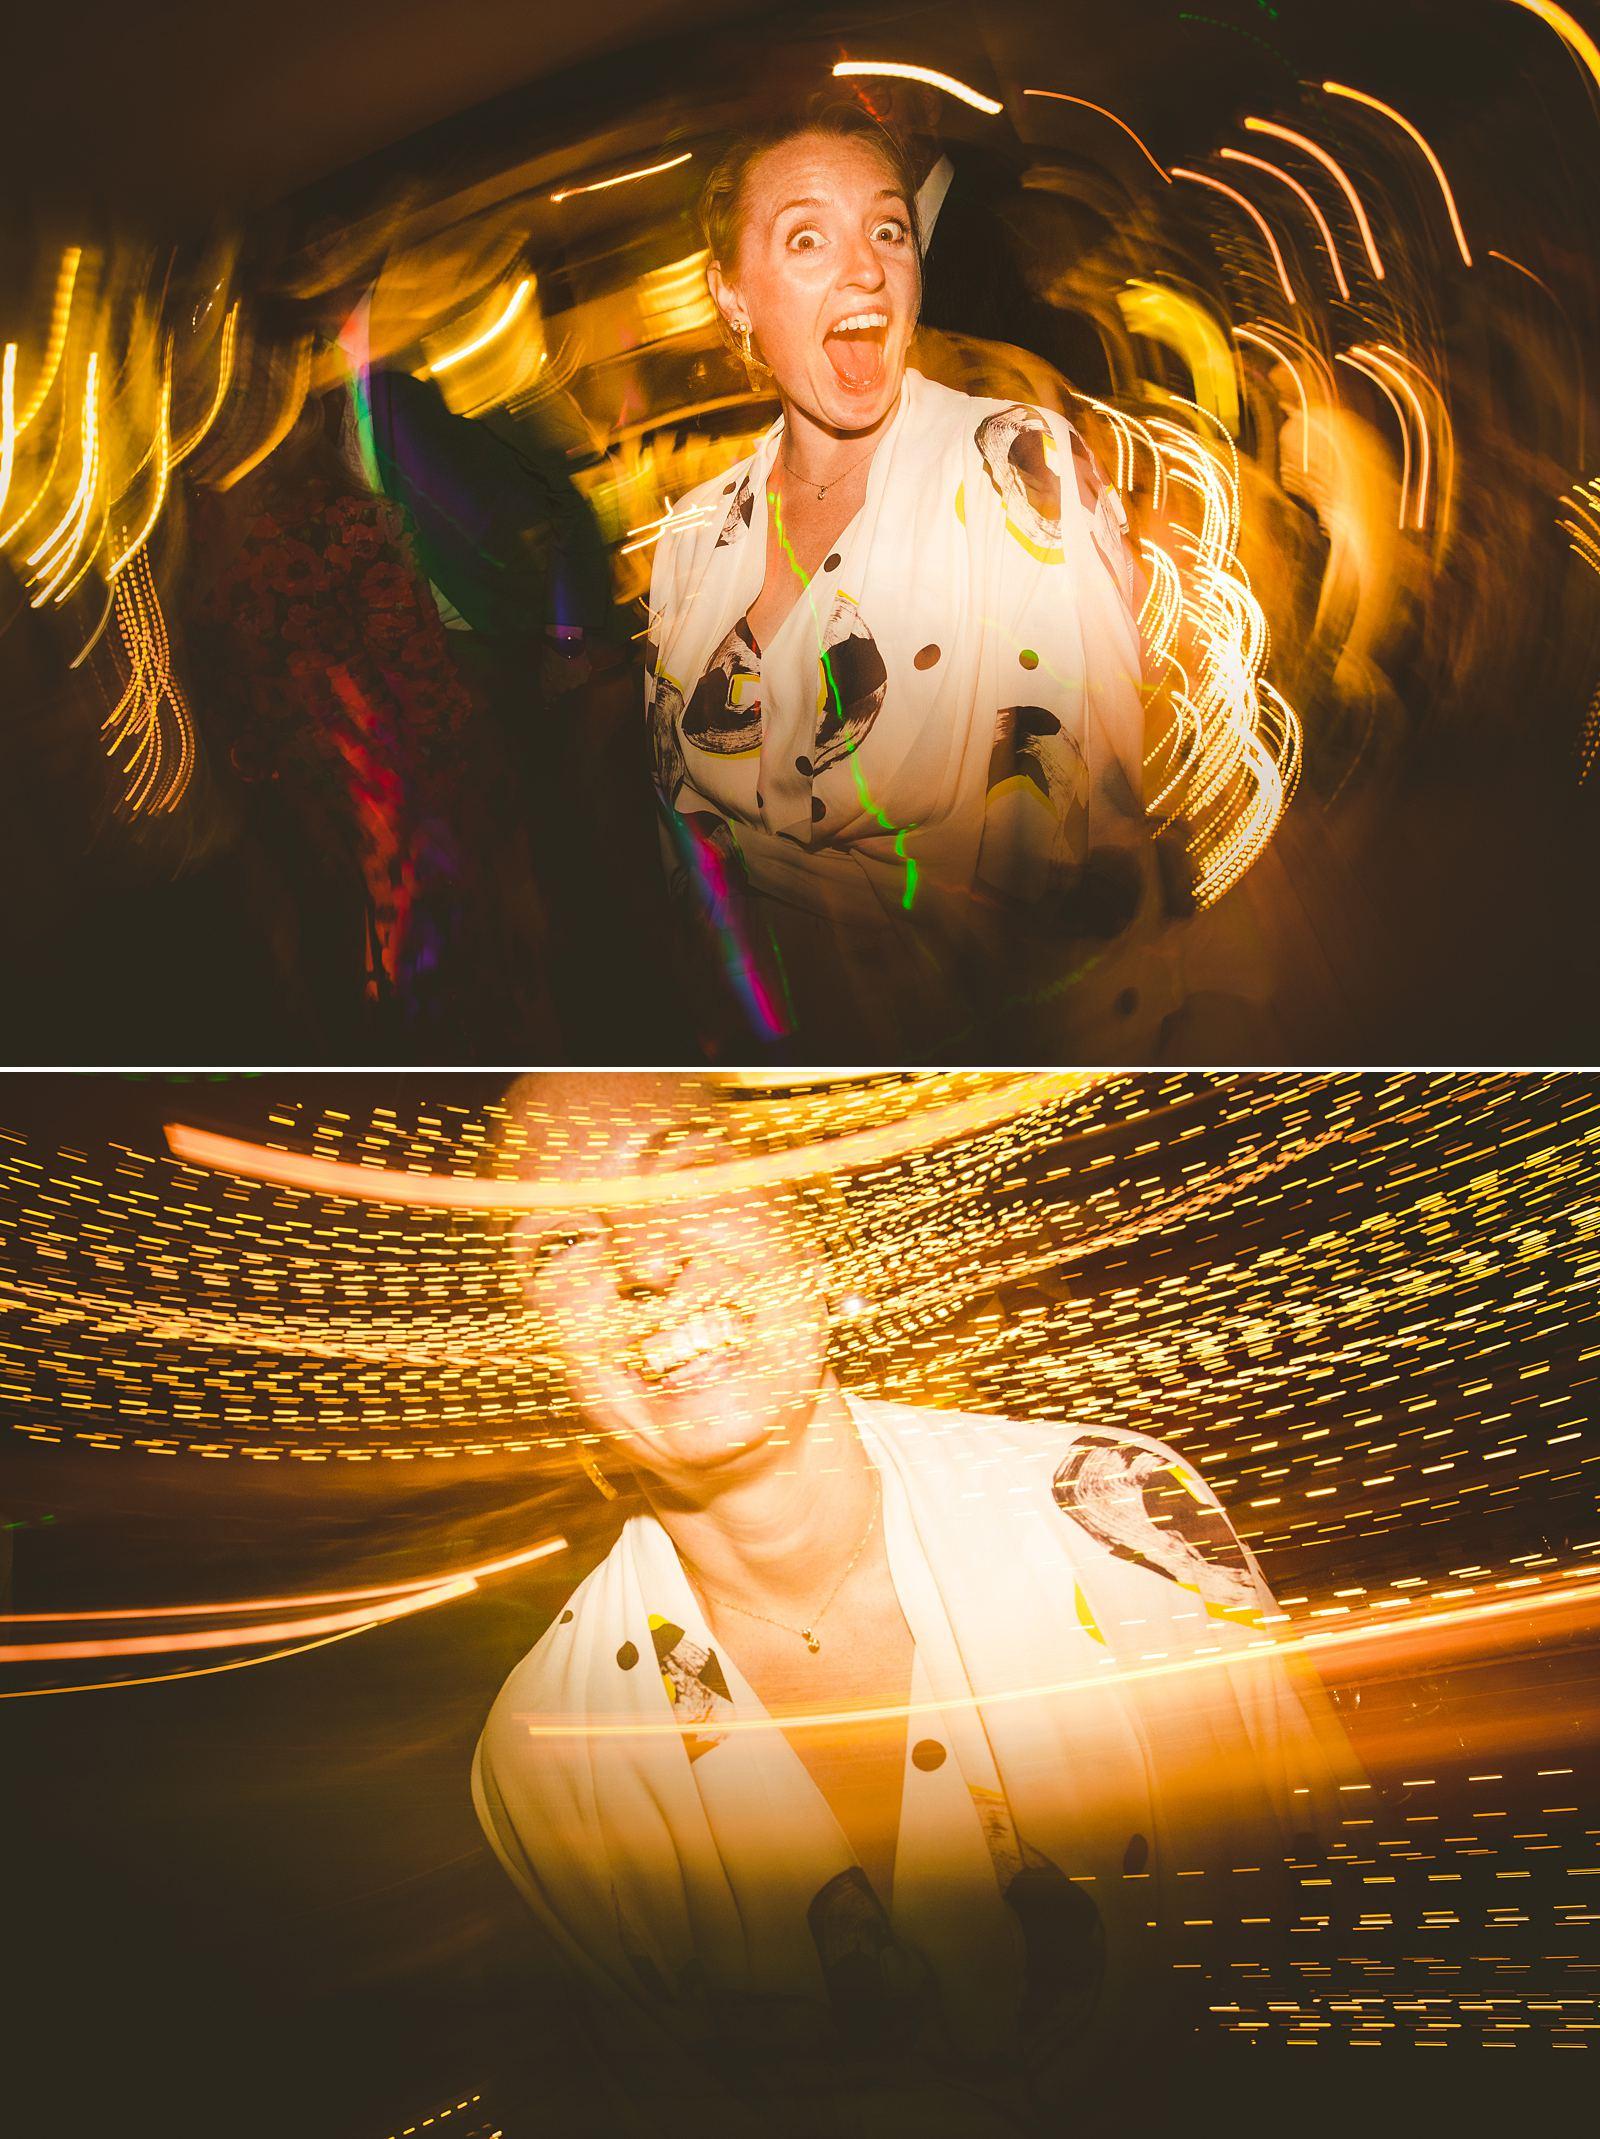 Creative wedding photography nighttime low light